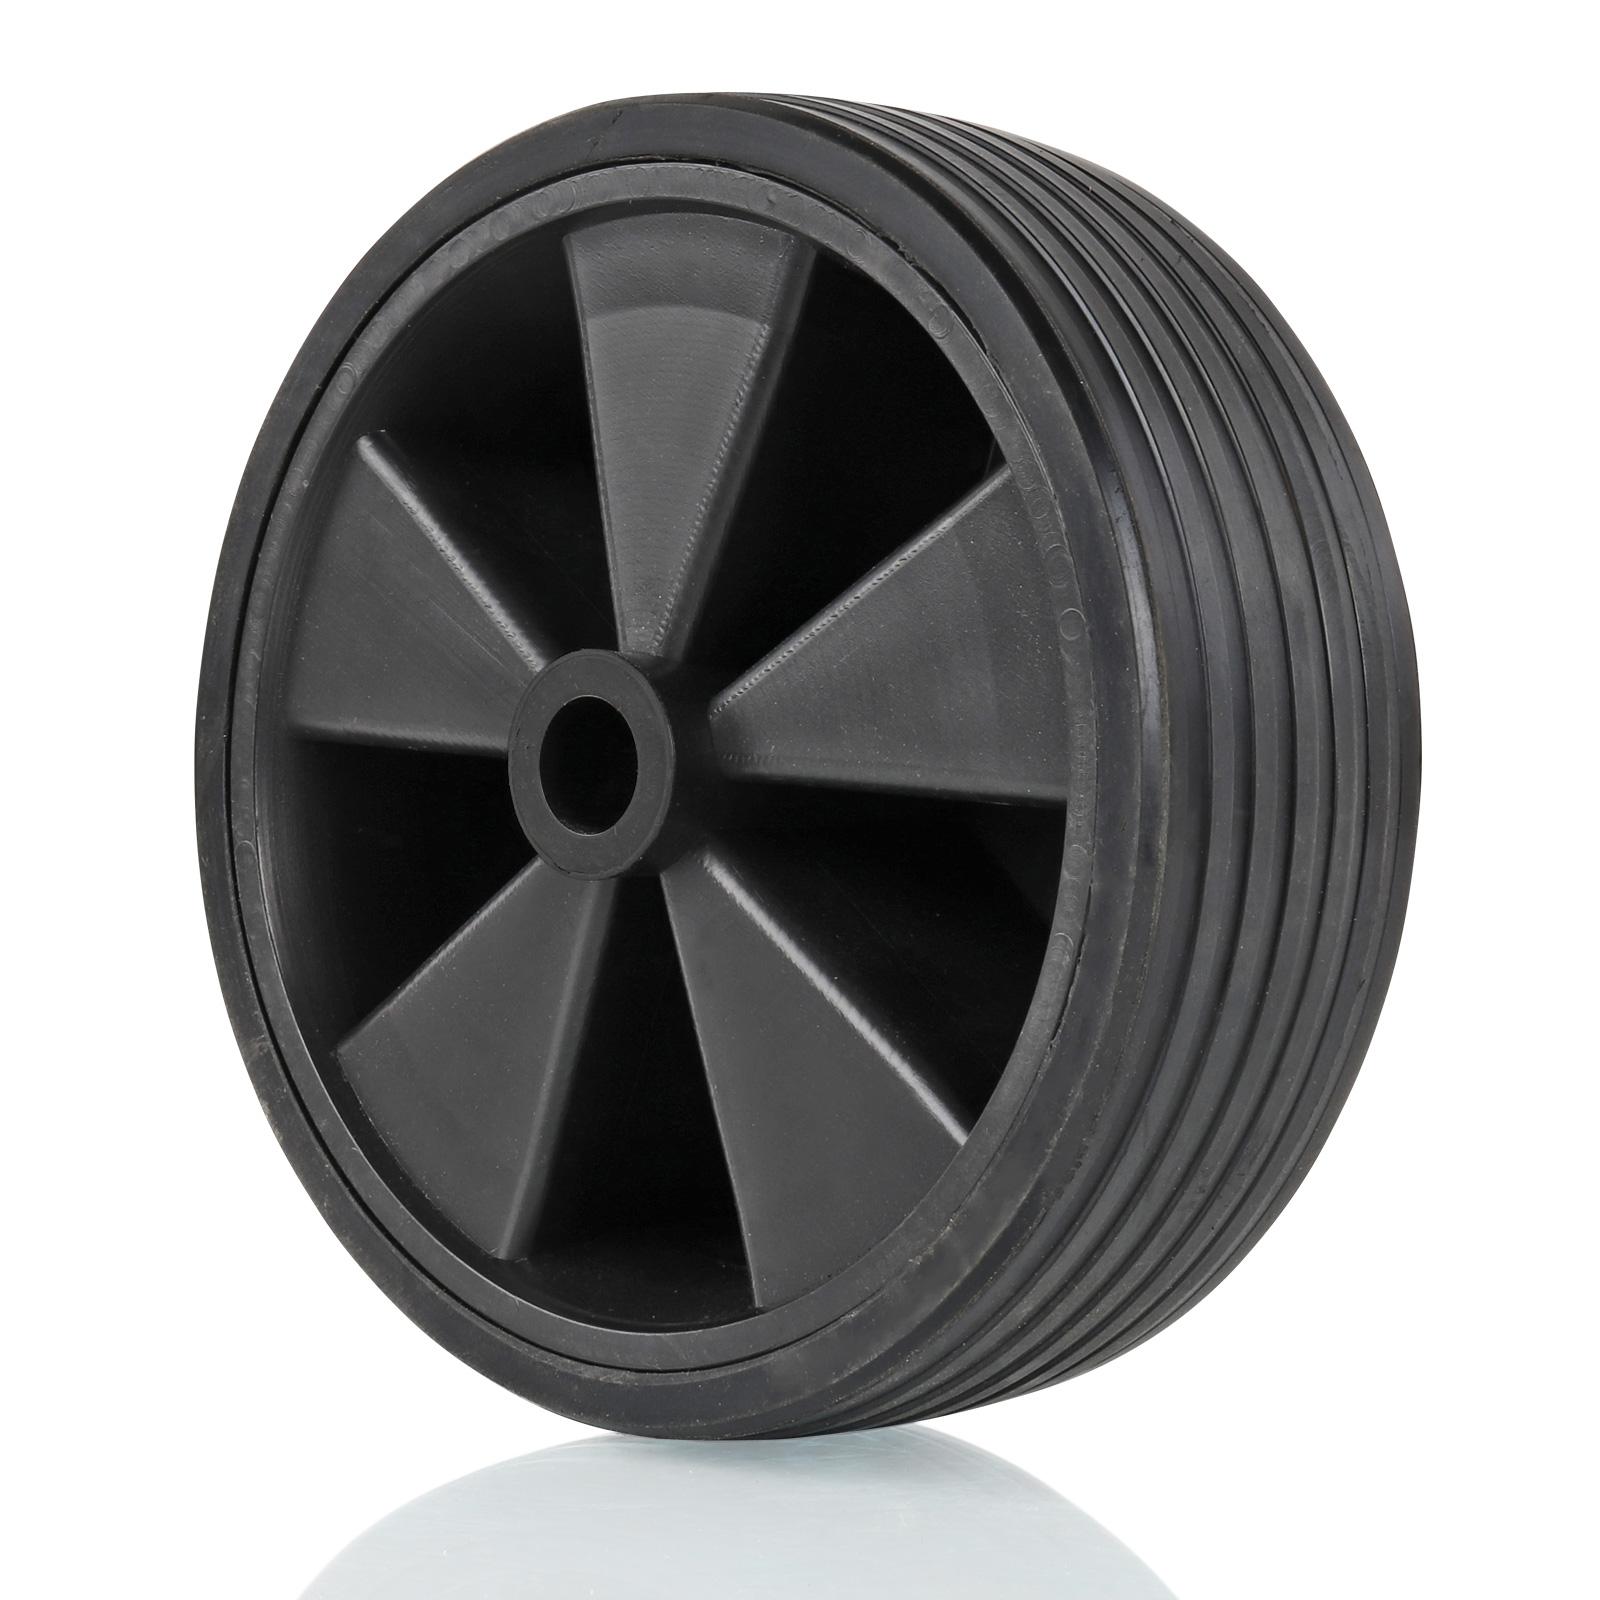 Stützrad Ersatzrad, Kunststoff-Felge, Vollgummi-Reifen, 220x70mm